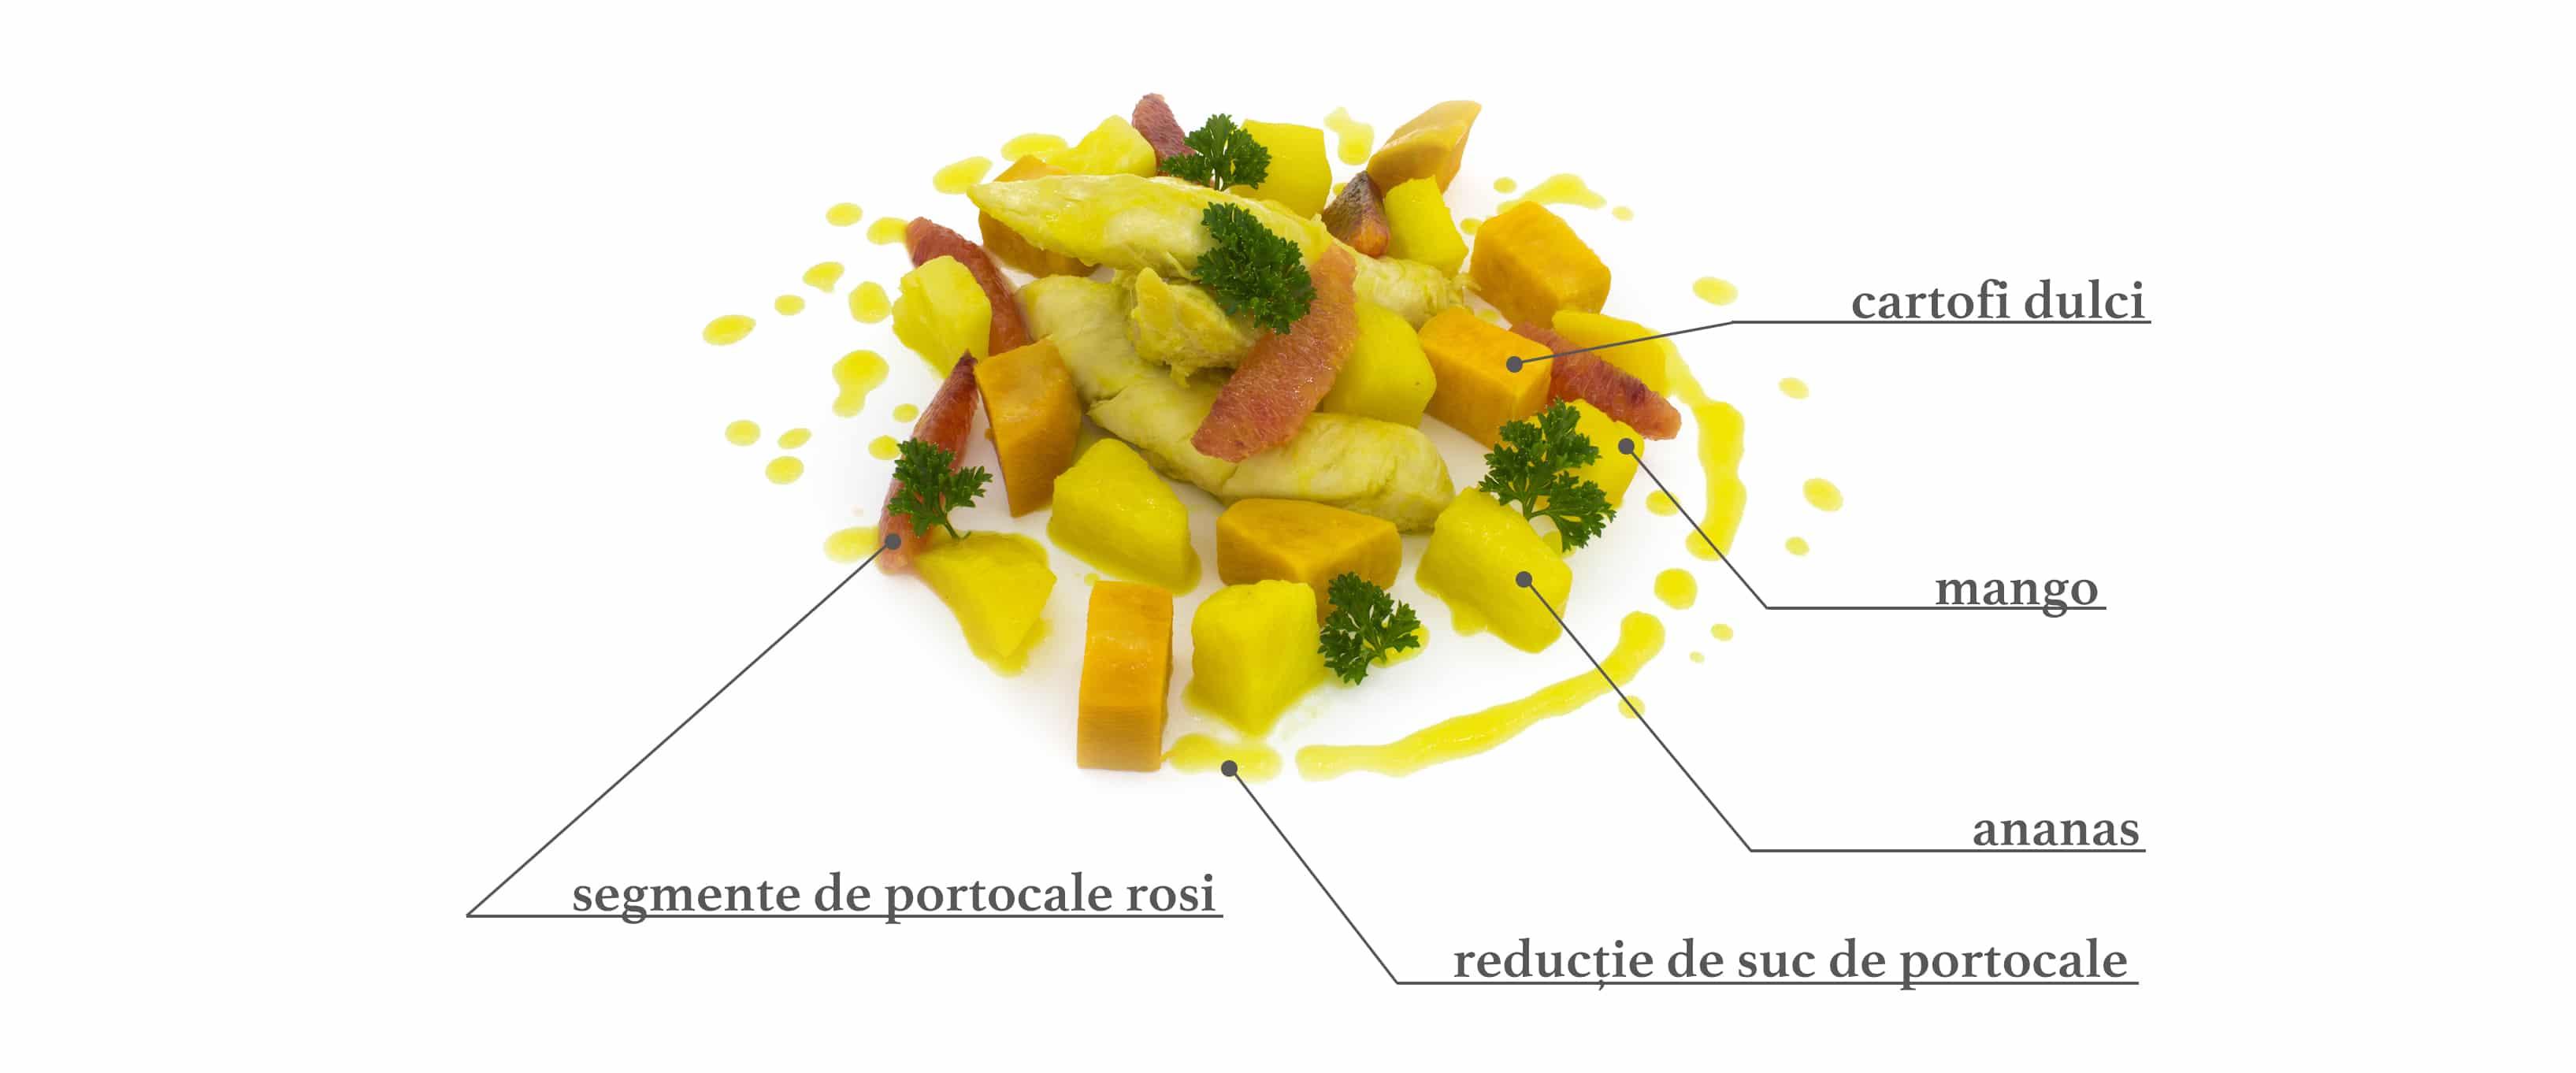 Pui cu mango ananas si cartofi dulci